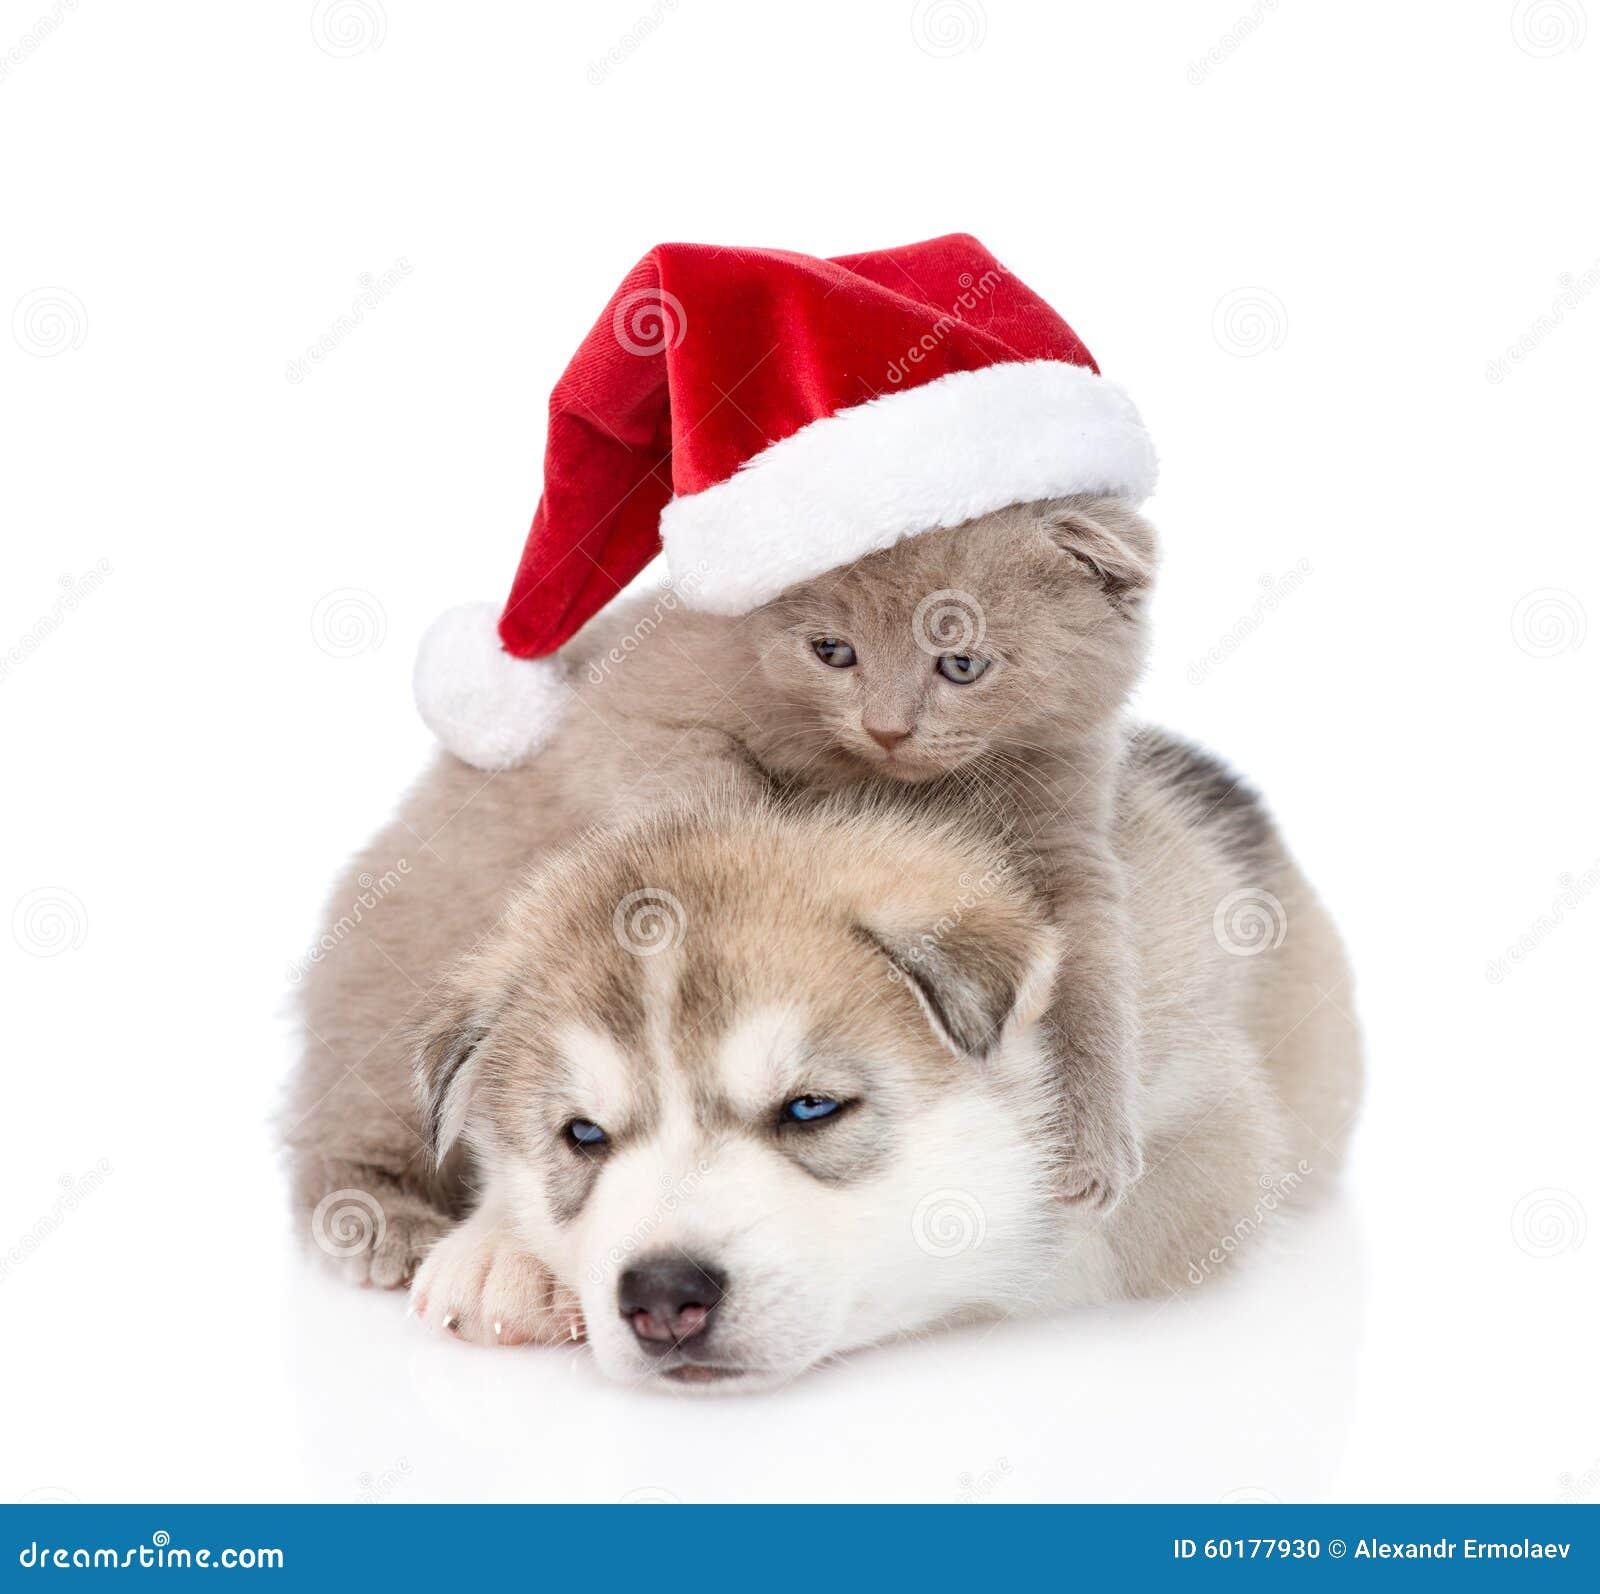 scottish kitten and siberian husky puppy with santa hat. Black Bedroom Furniture Sets. Home Design Ideas